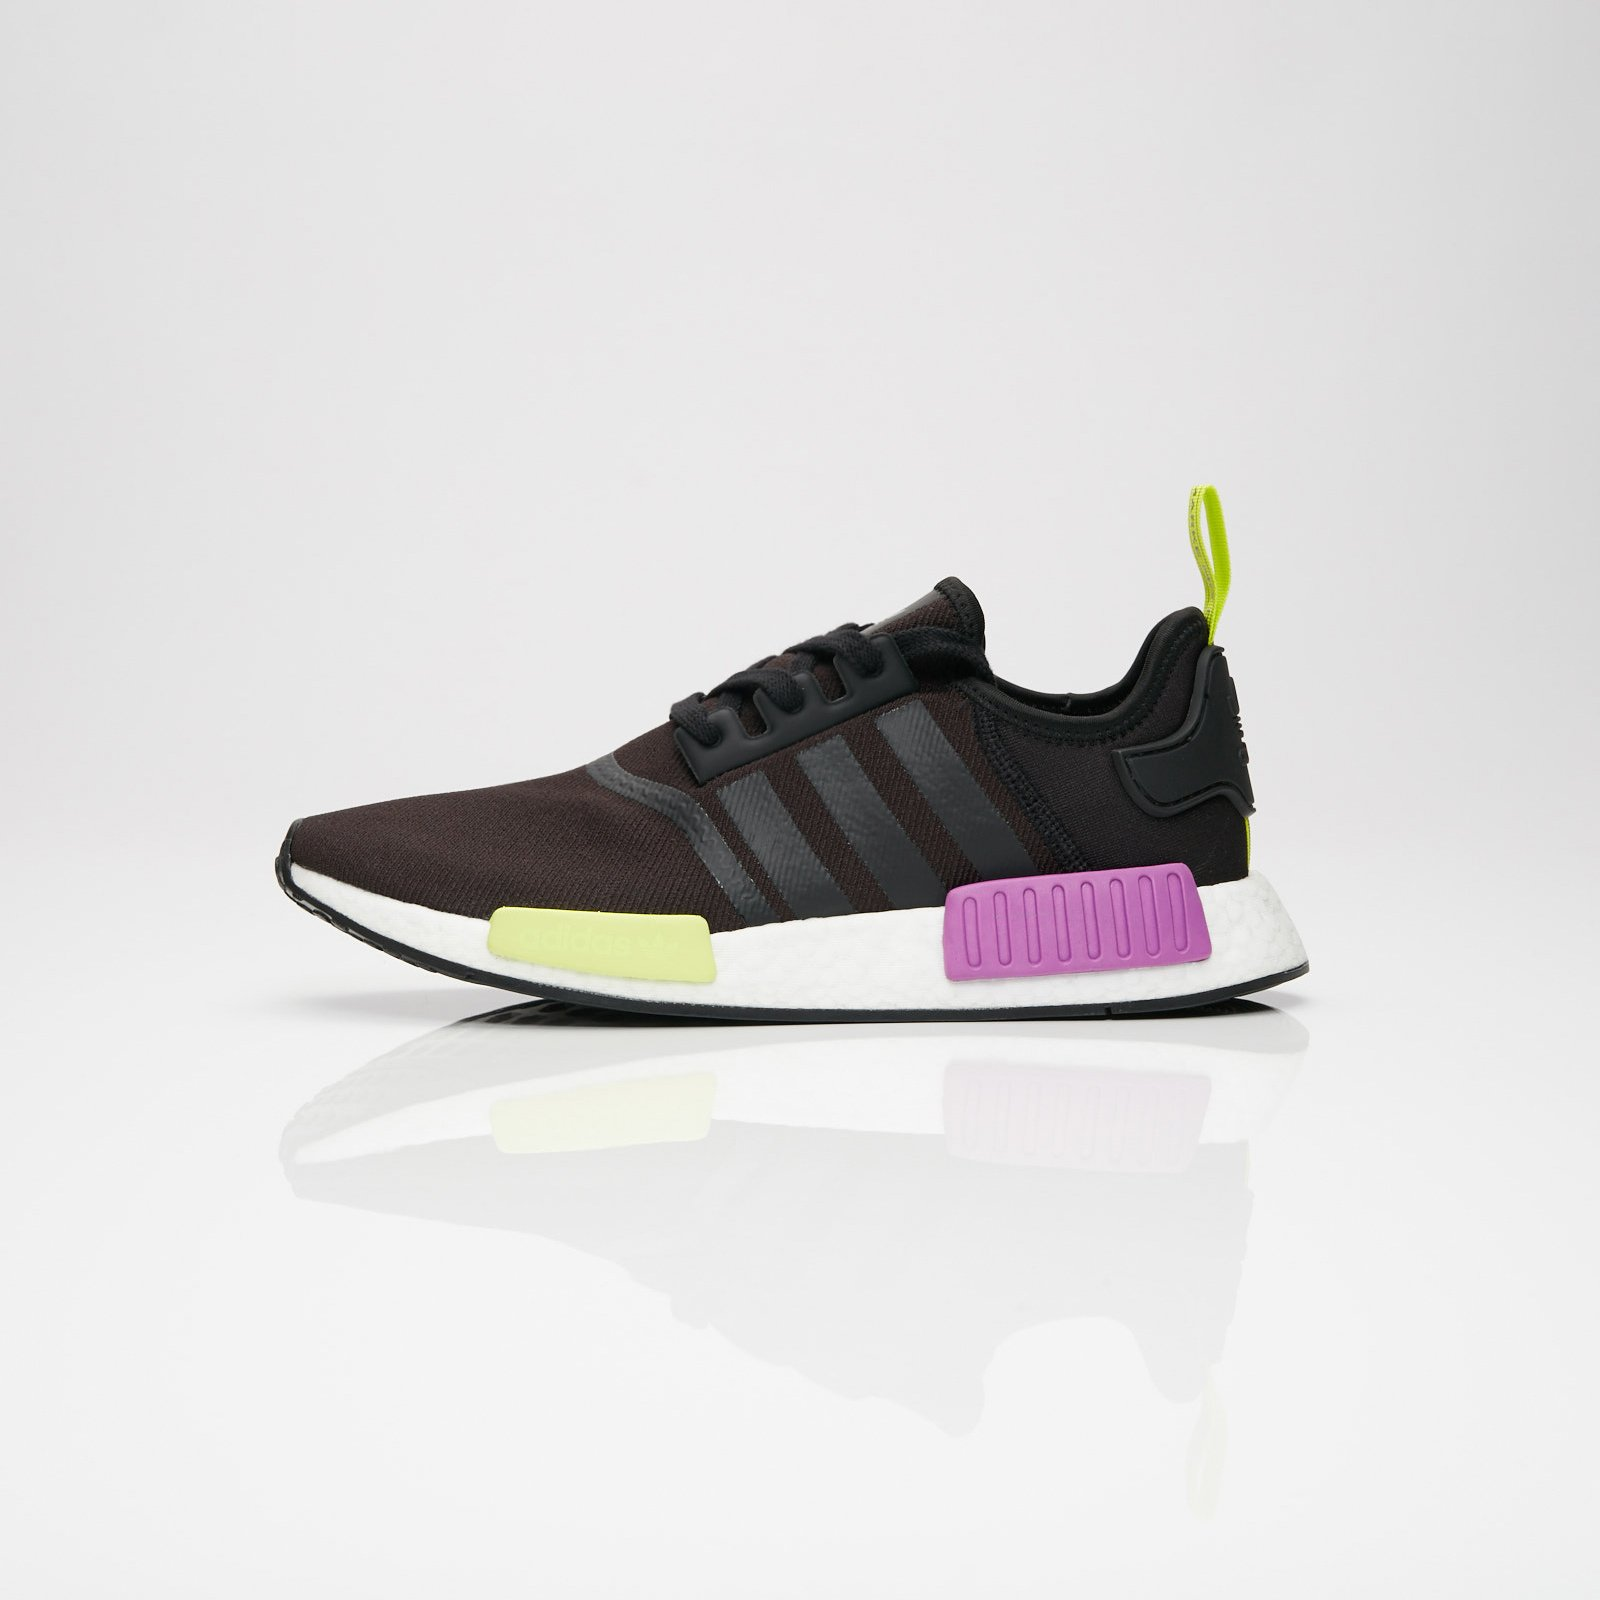 adidas NMD_R1 - D96627 - Sneakersnstuff